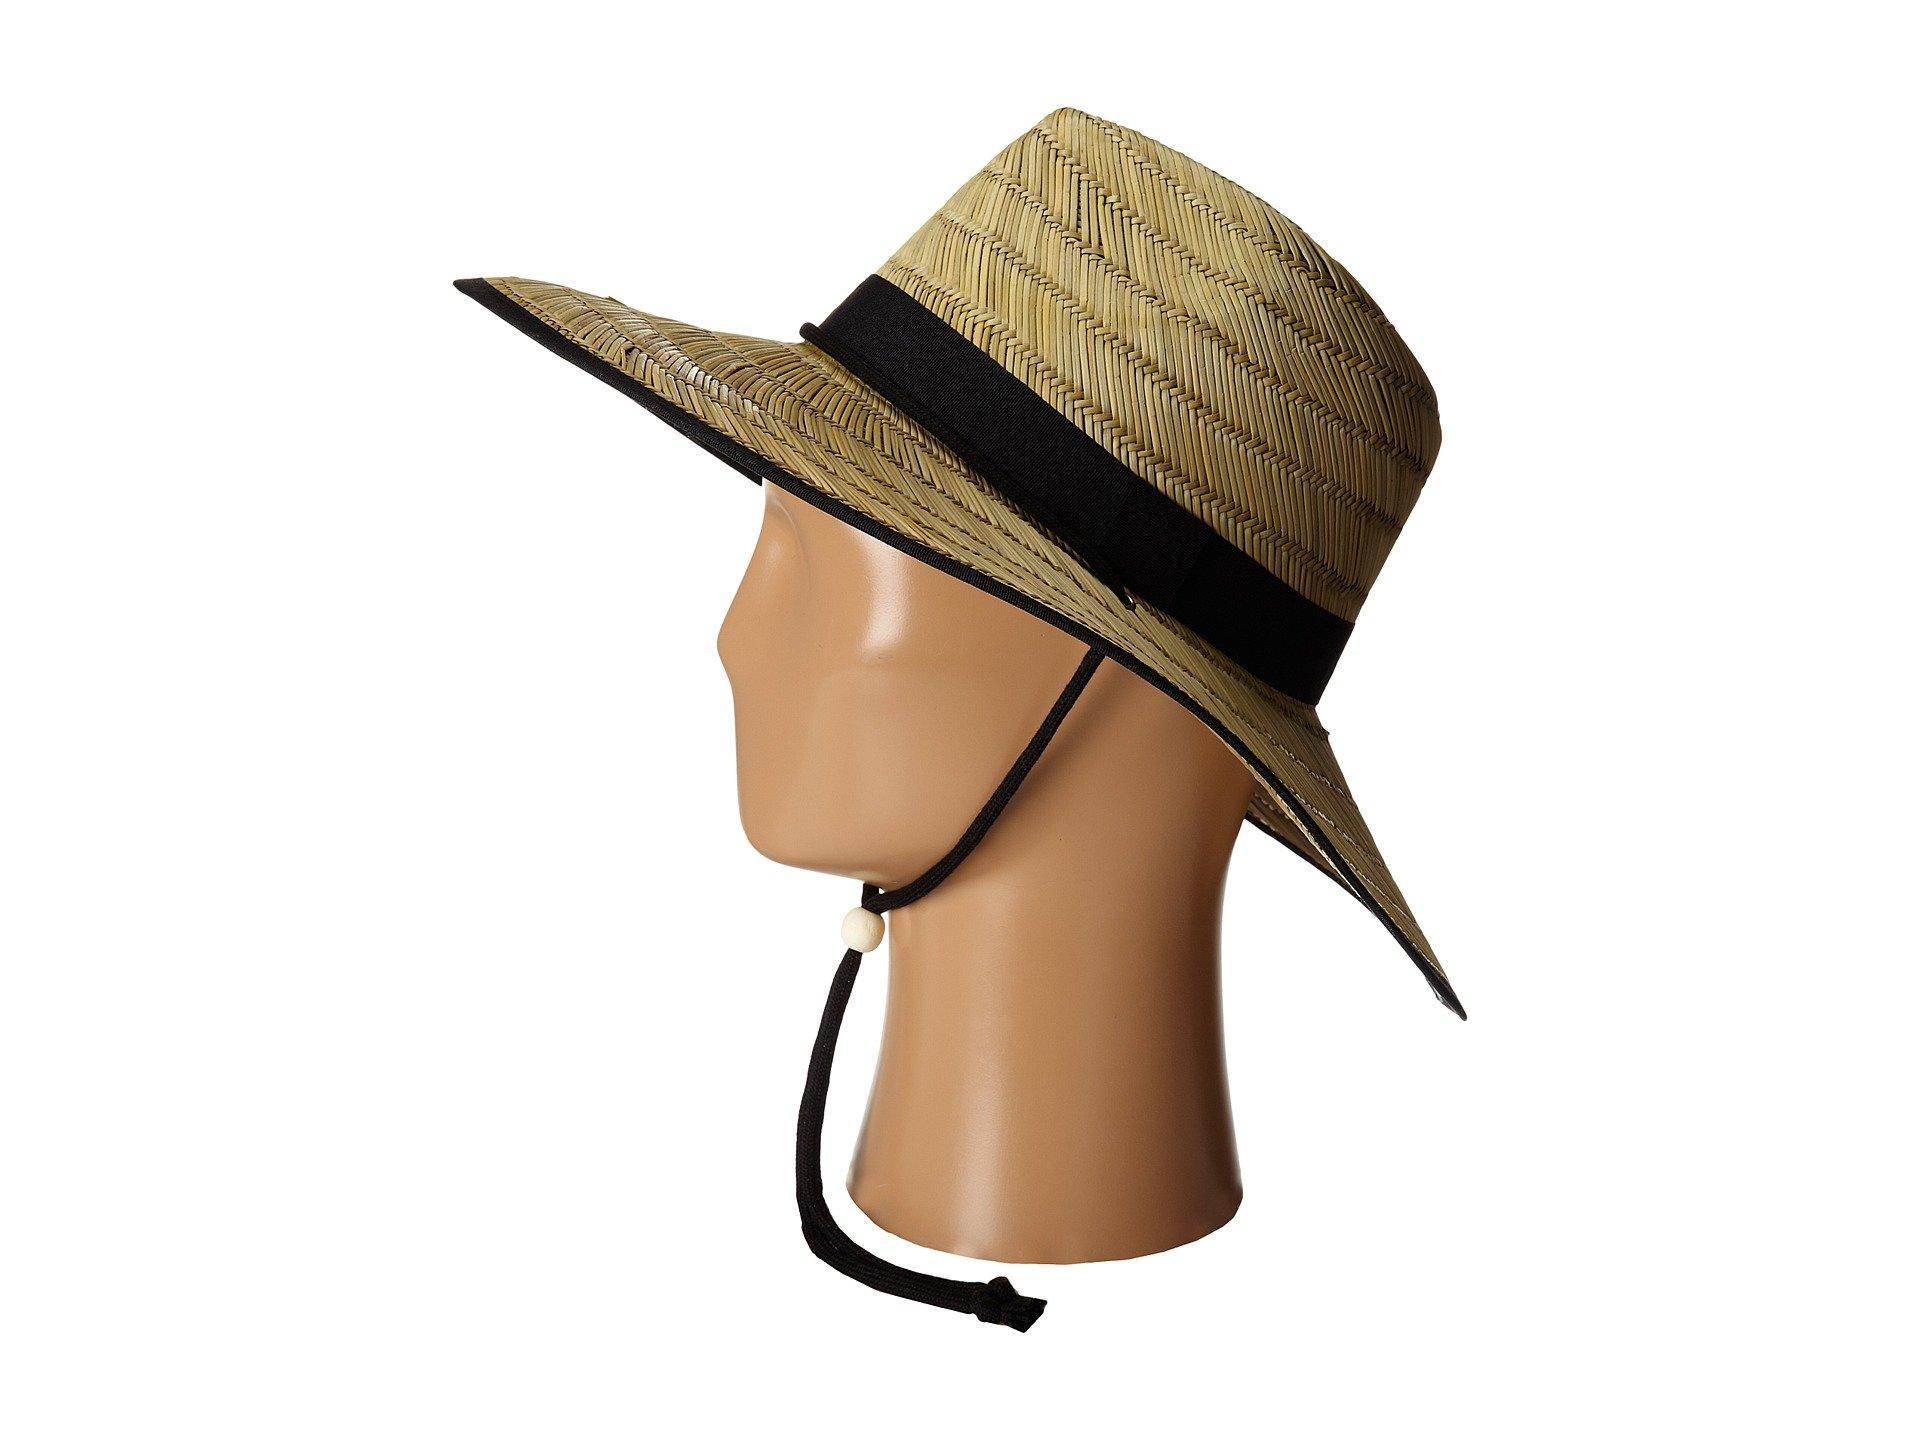 00482ed7643a3 San Diego Hat Company - Rsl5556 Rush Straw Lifeguard W  Band And Chin Cord  (. View fullscreen